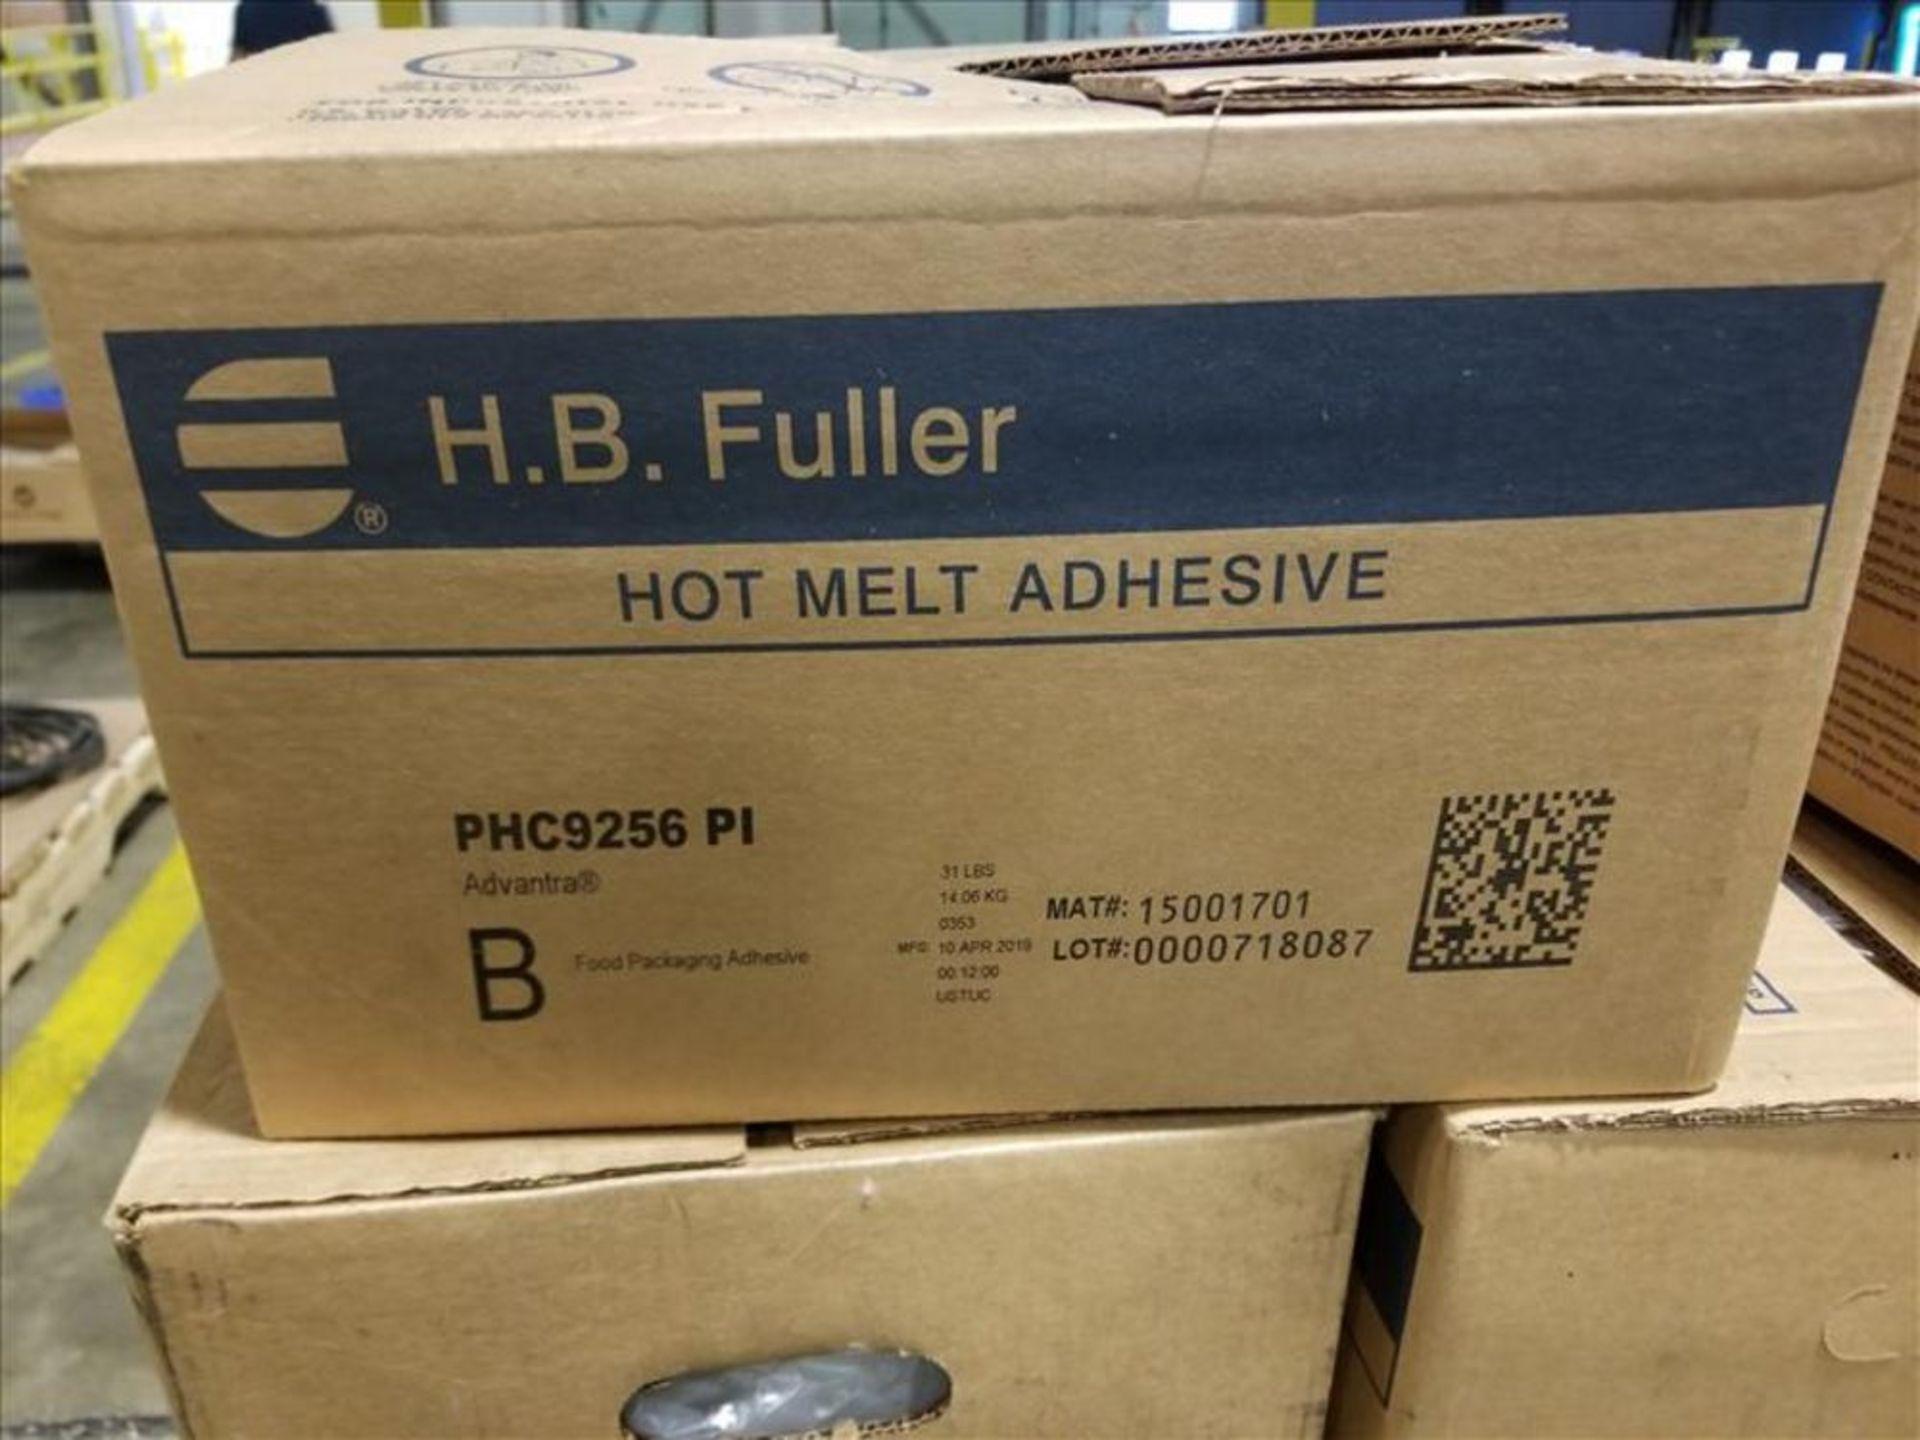 Lot (30) Case H. B. Fuller Hot Melt Adhesive - Image 2 of 2